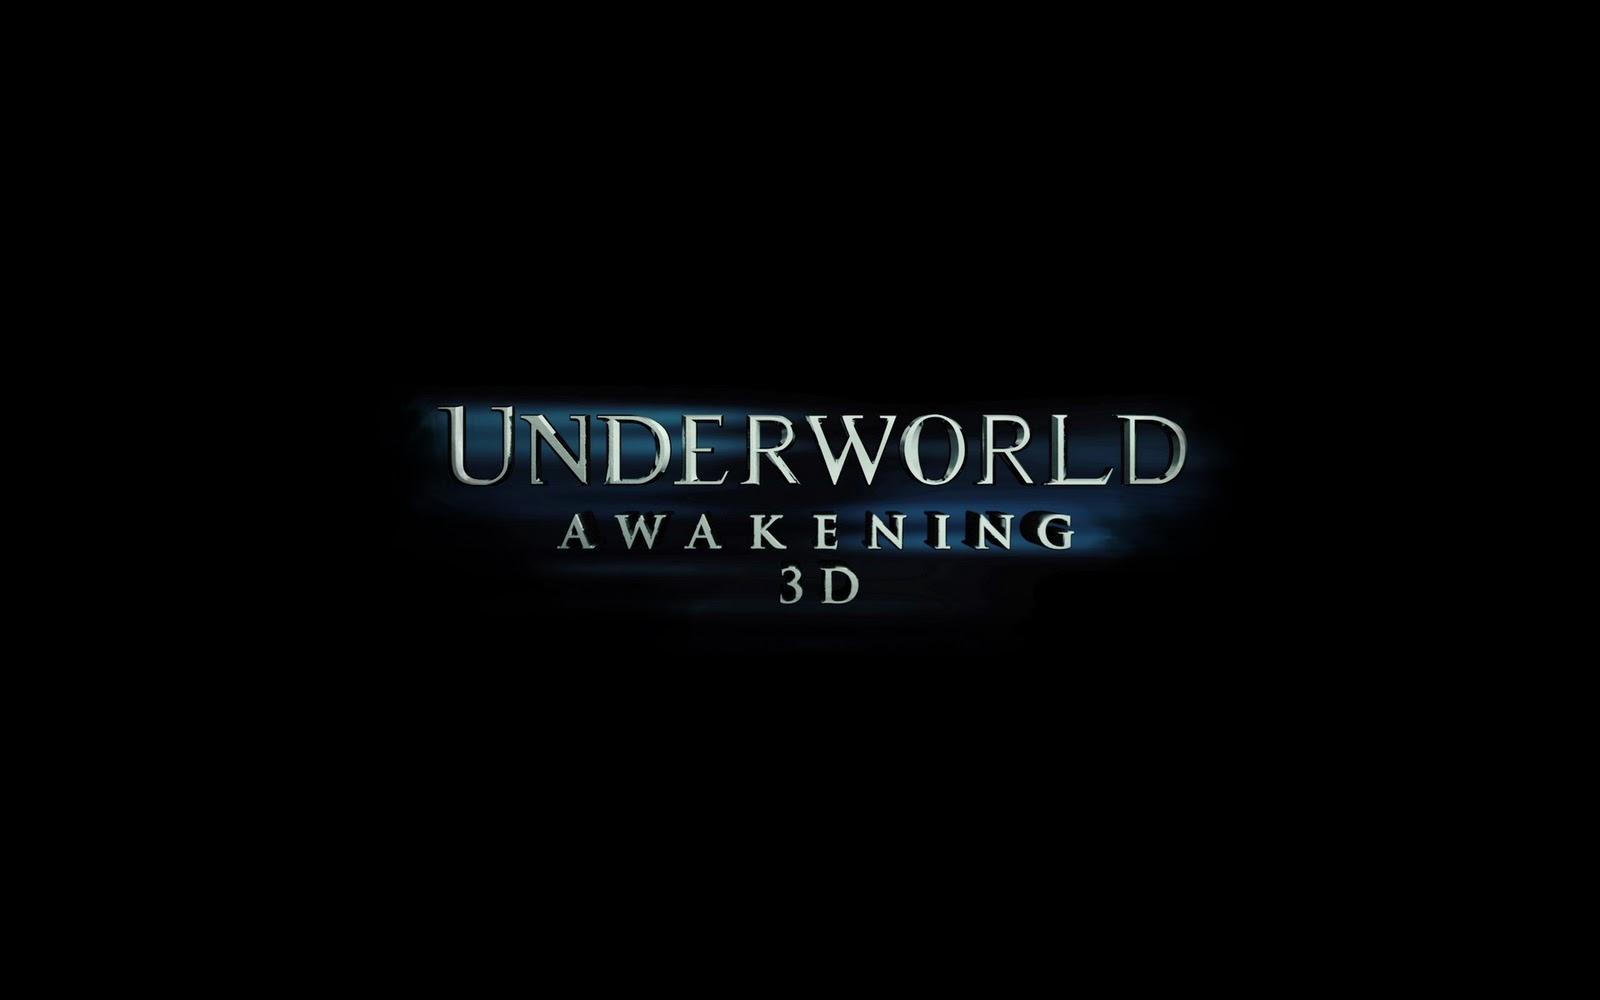 underworld awakening wallpapers 1 underworld awakening wallpapers 2 1600x1000